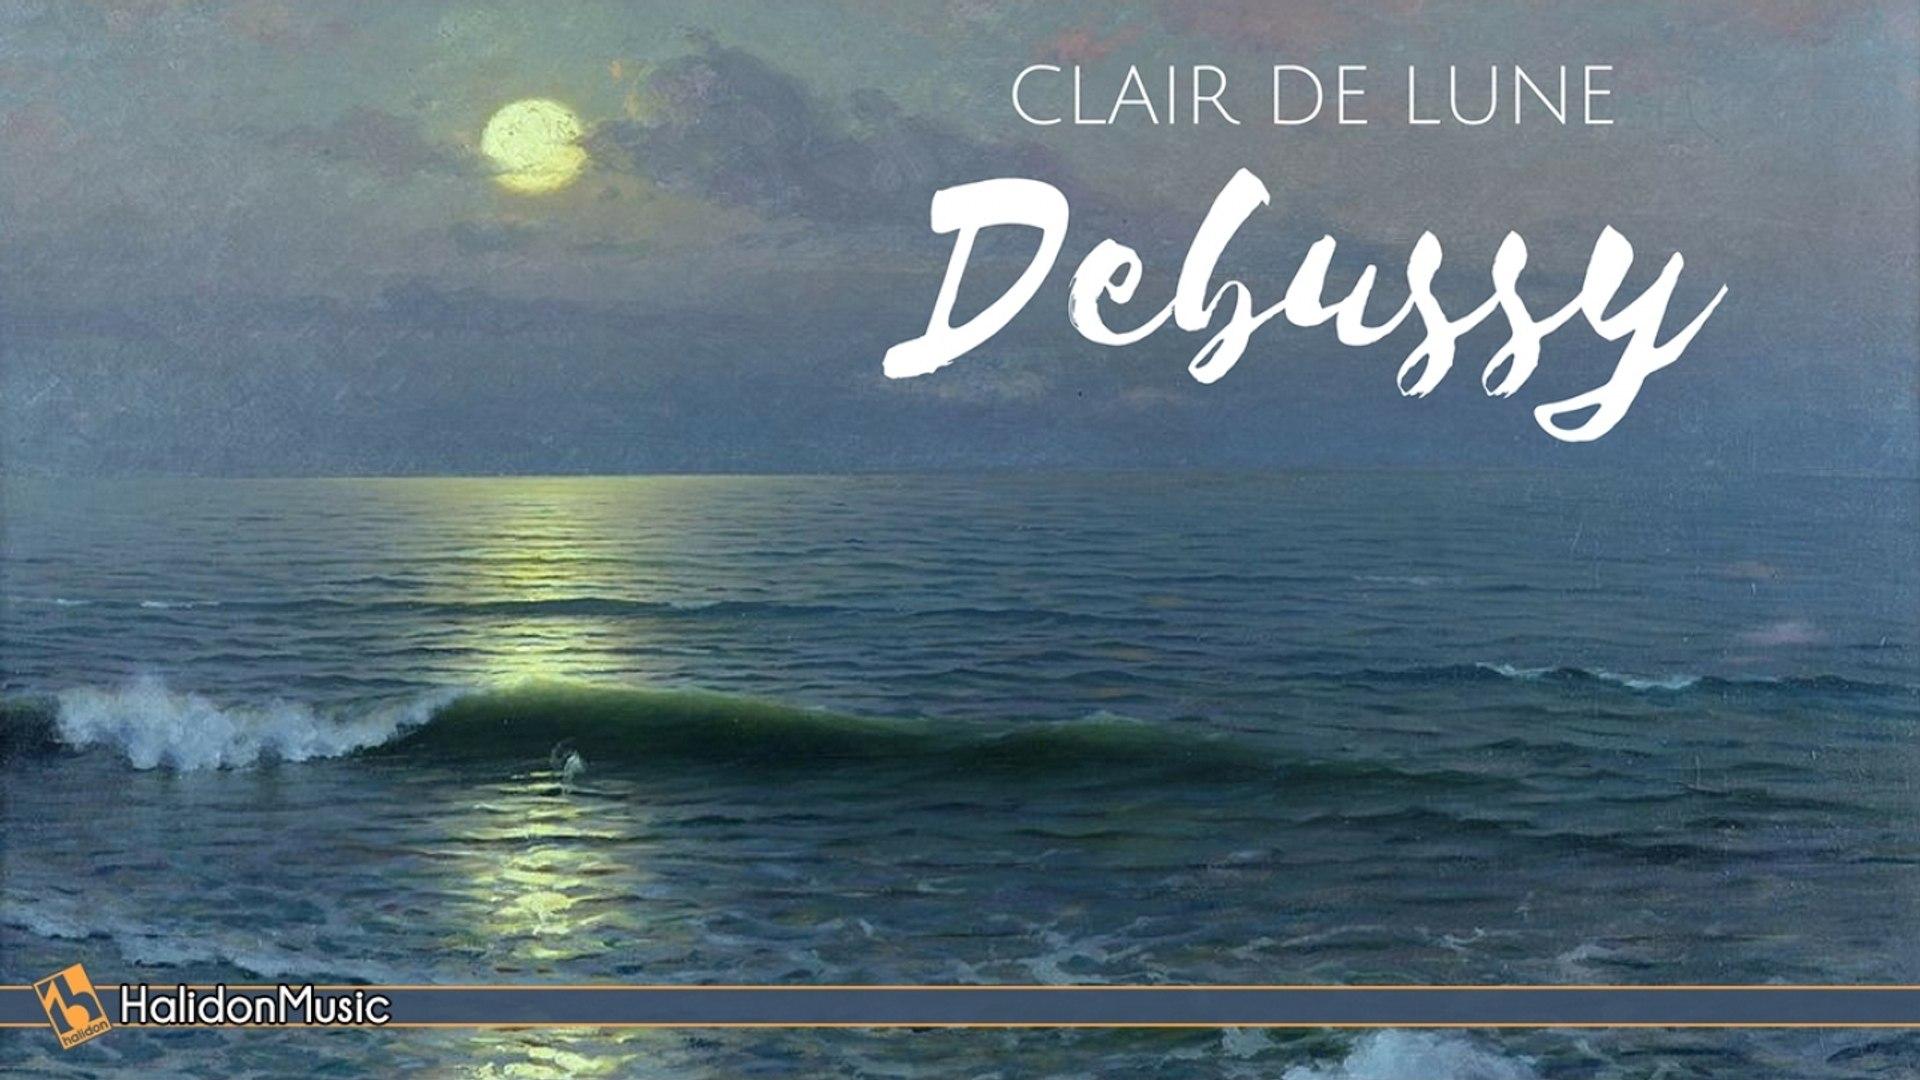 Giovanni Umberto Battel - Claude Debussy - Clair de Lune   Classical Piano  Music